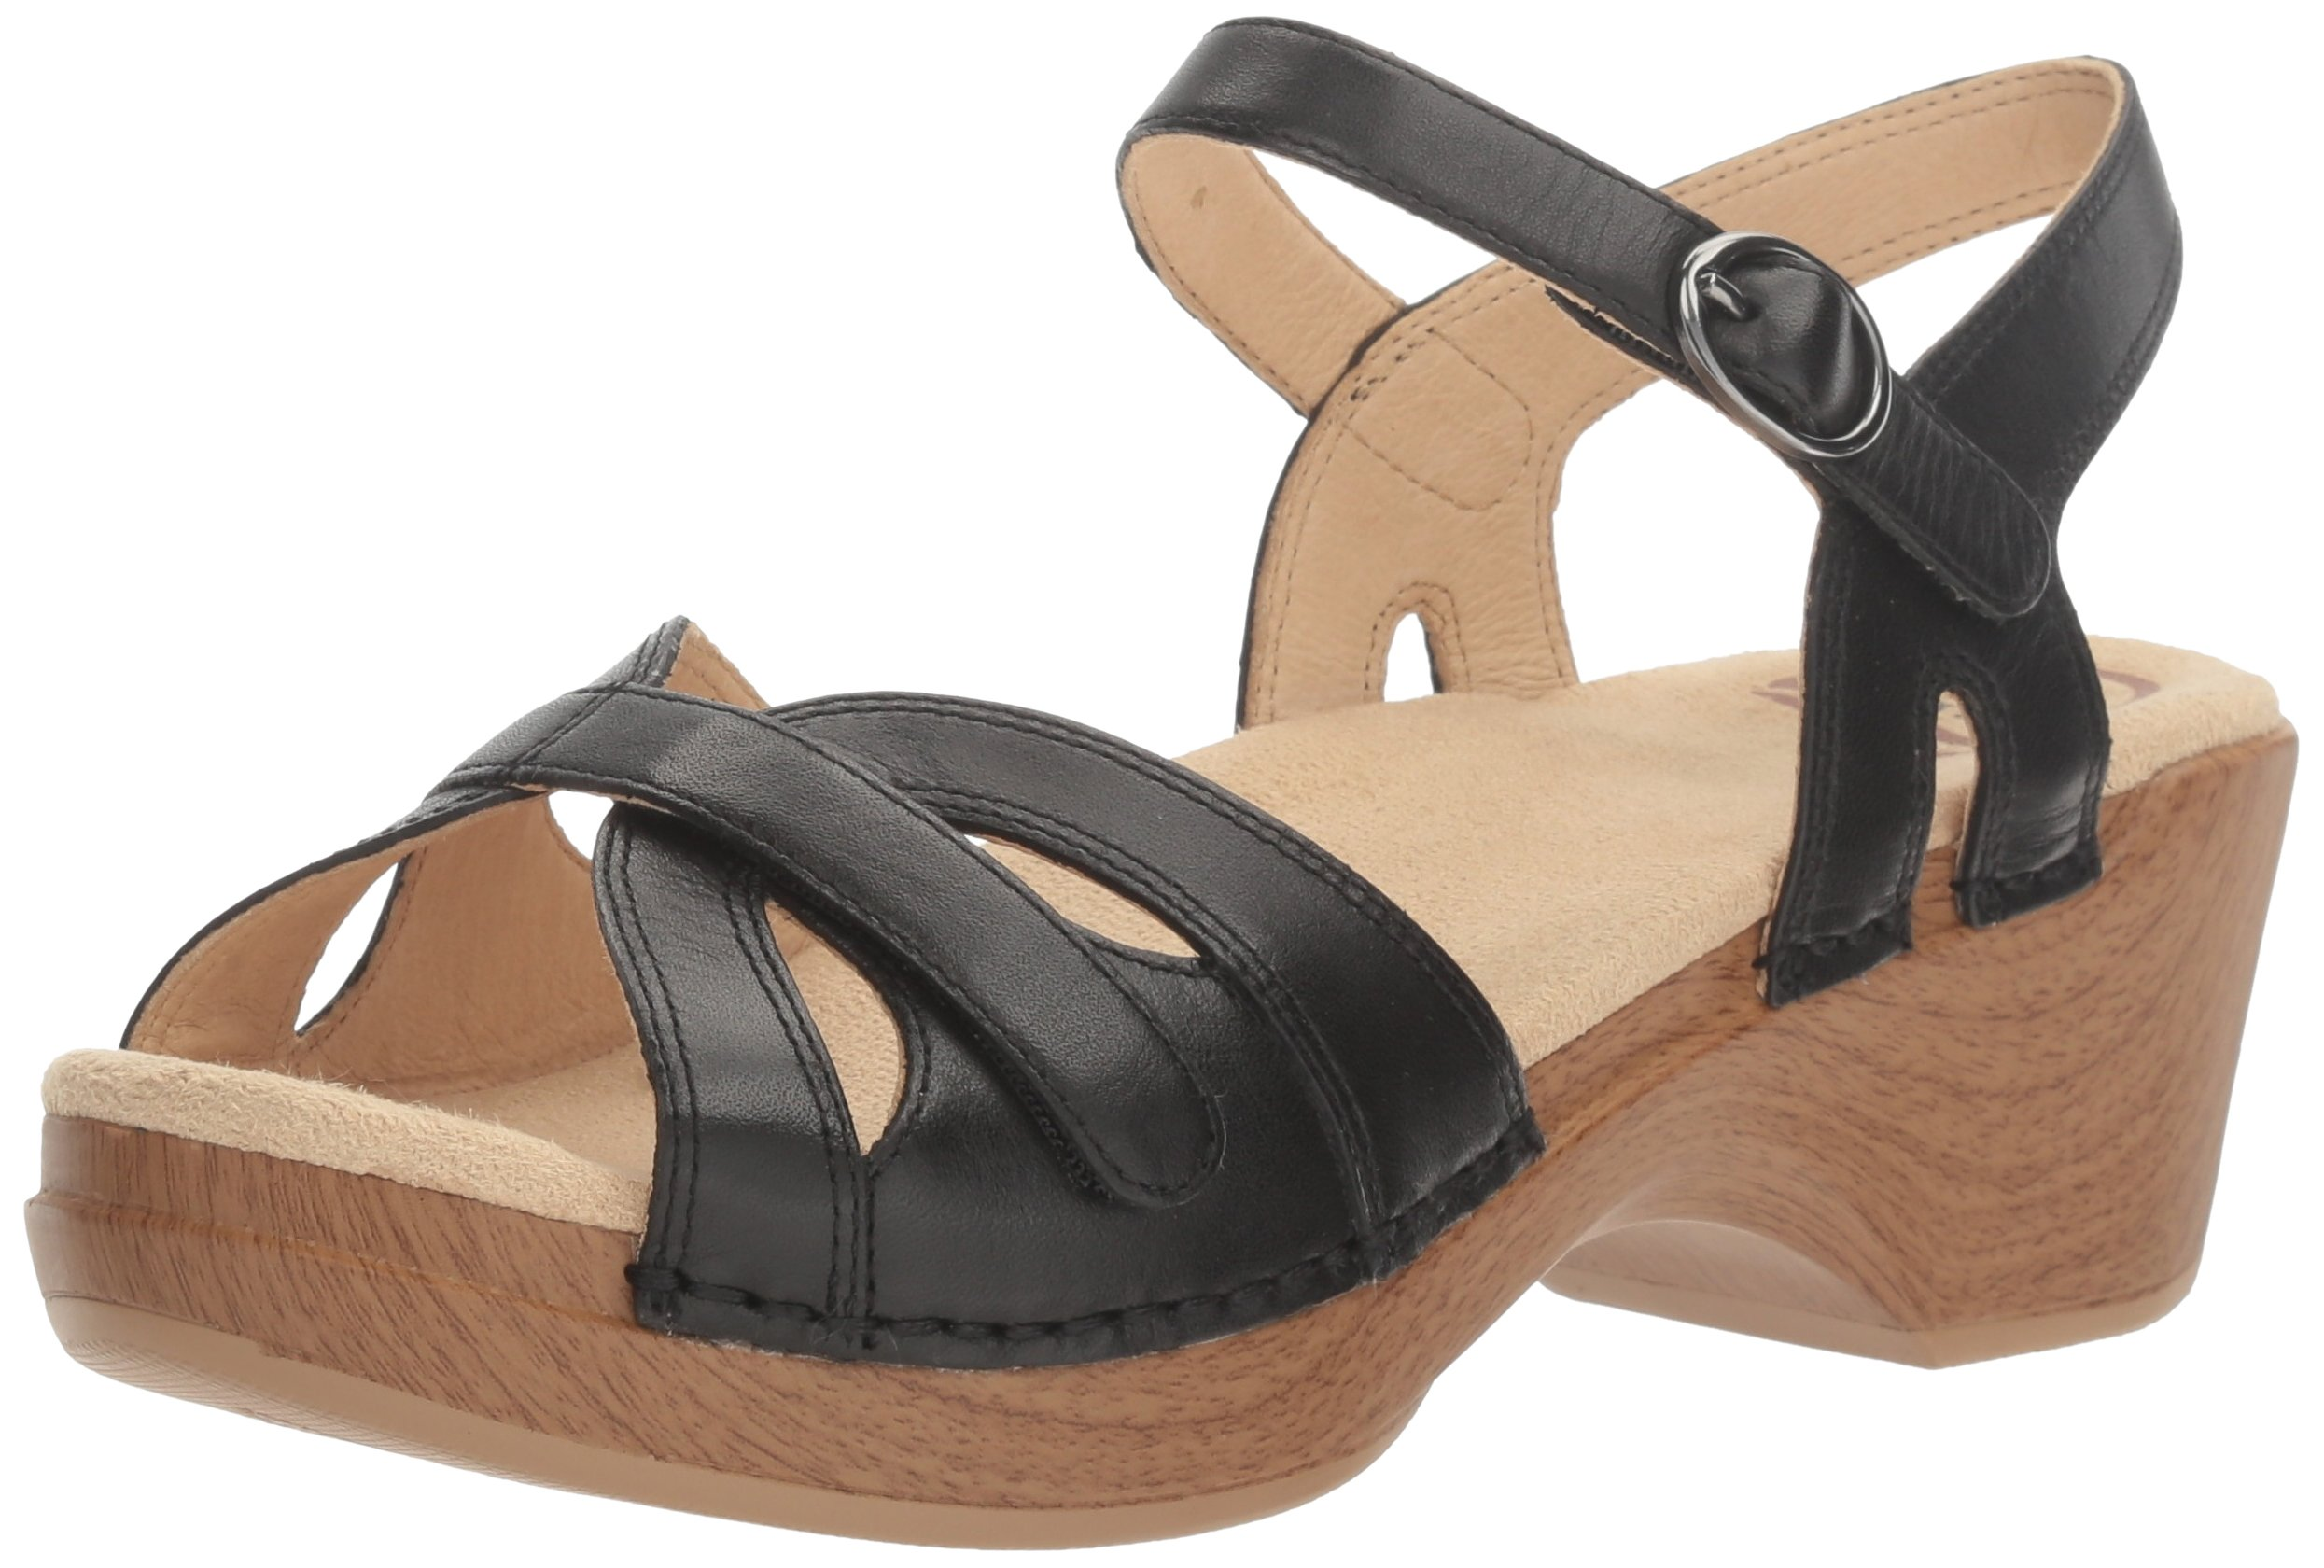 Dansko Women's Season Flat Sandal, Black Full Grain, 36 EU/5.5-6 M US